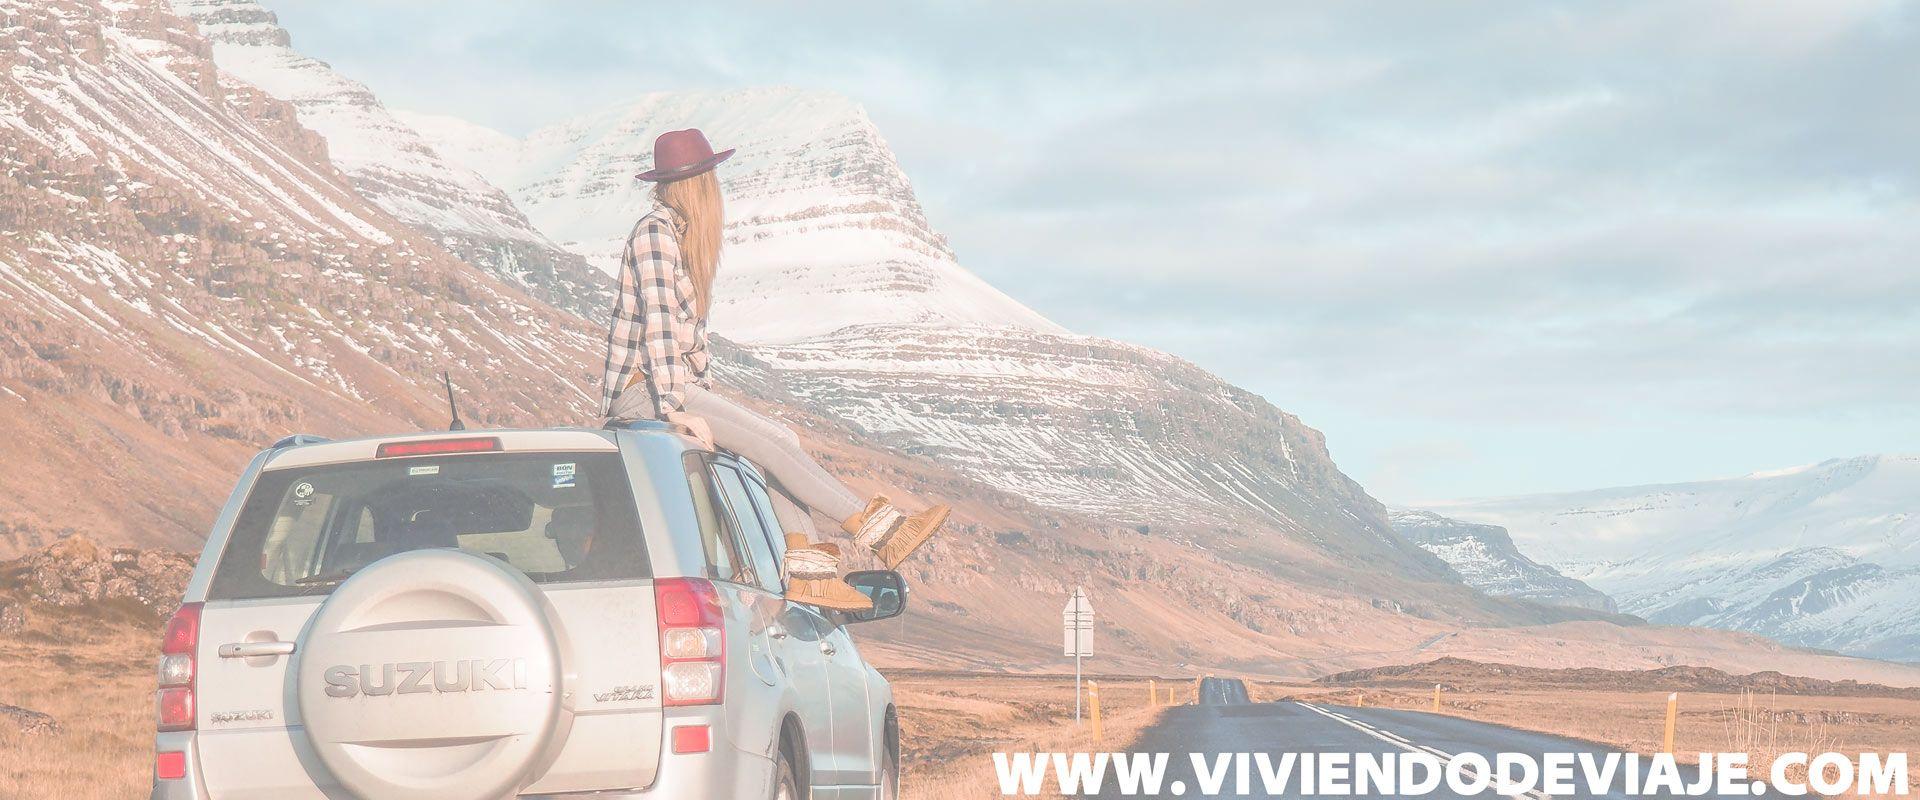 Alquilar coche en Islandia